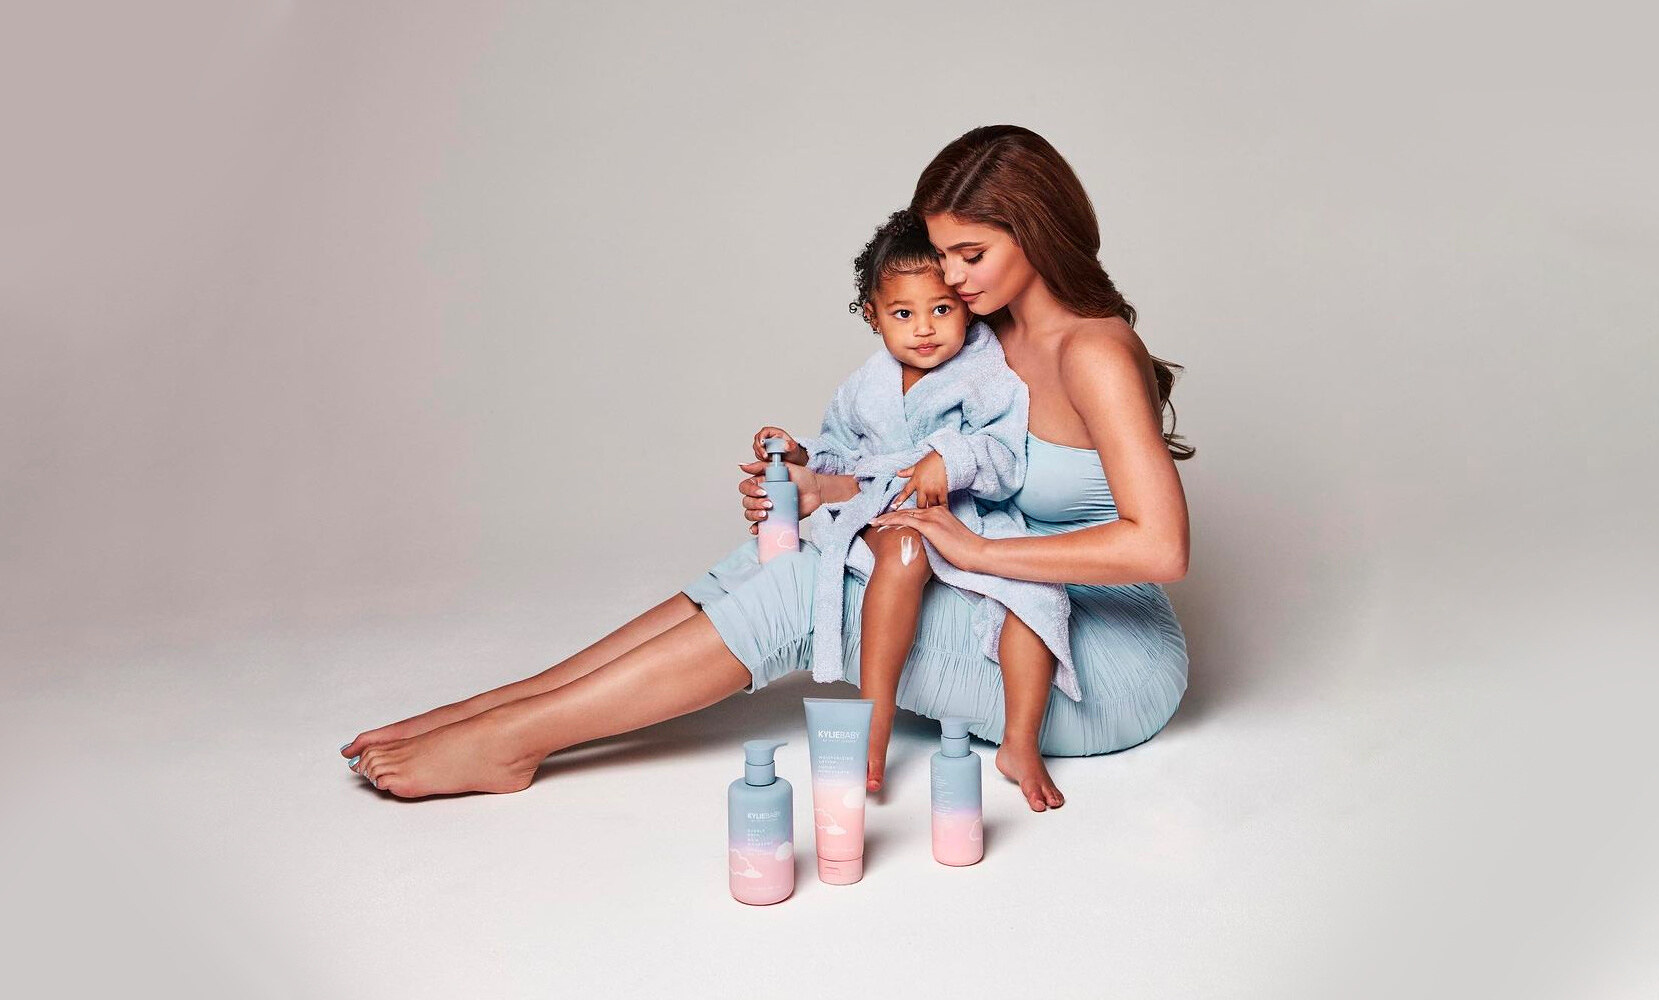 Kylie Jenner Stormi Kylie Baby Cosmetics